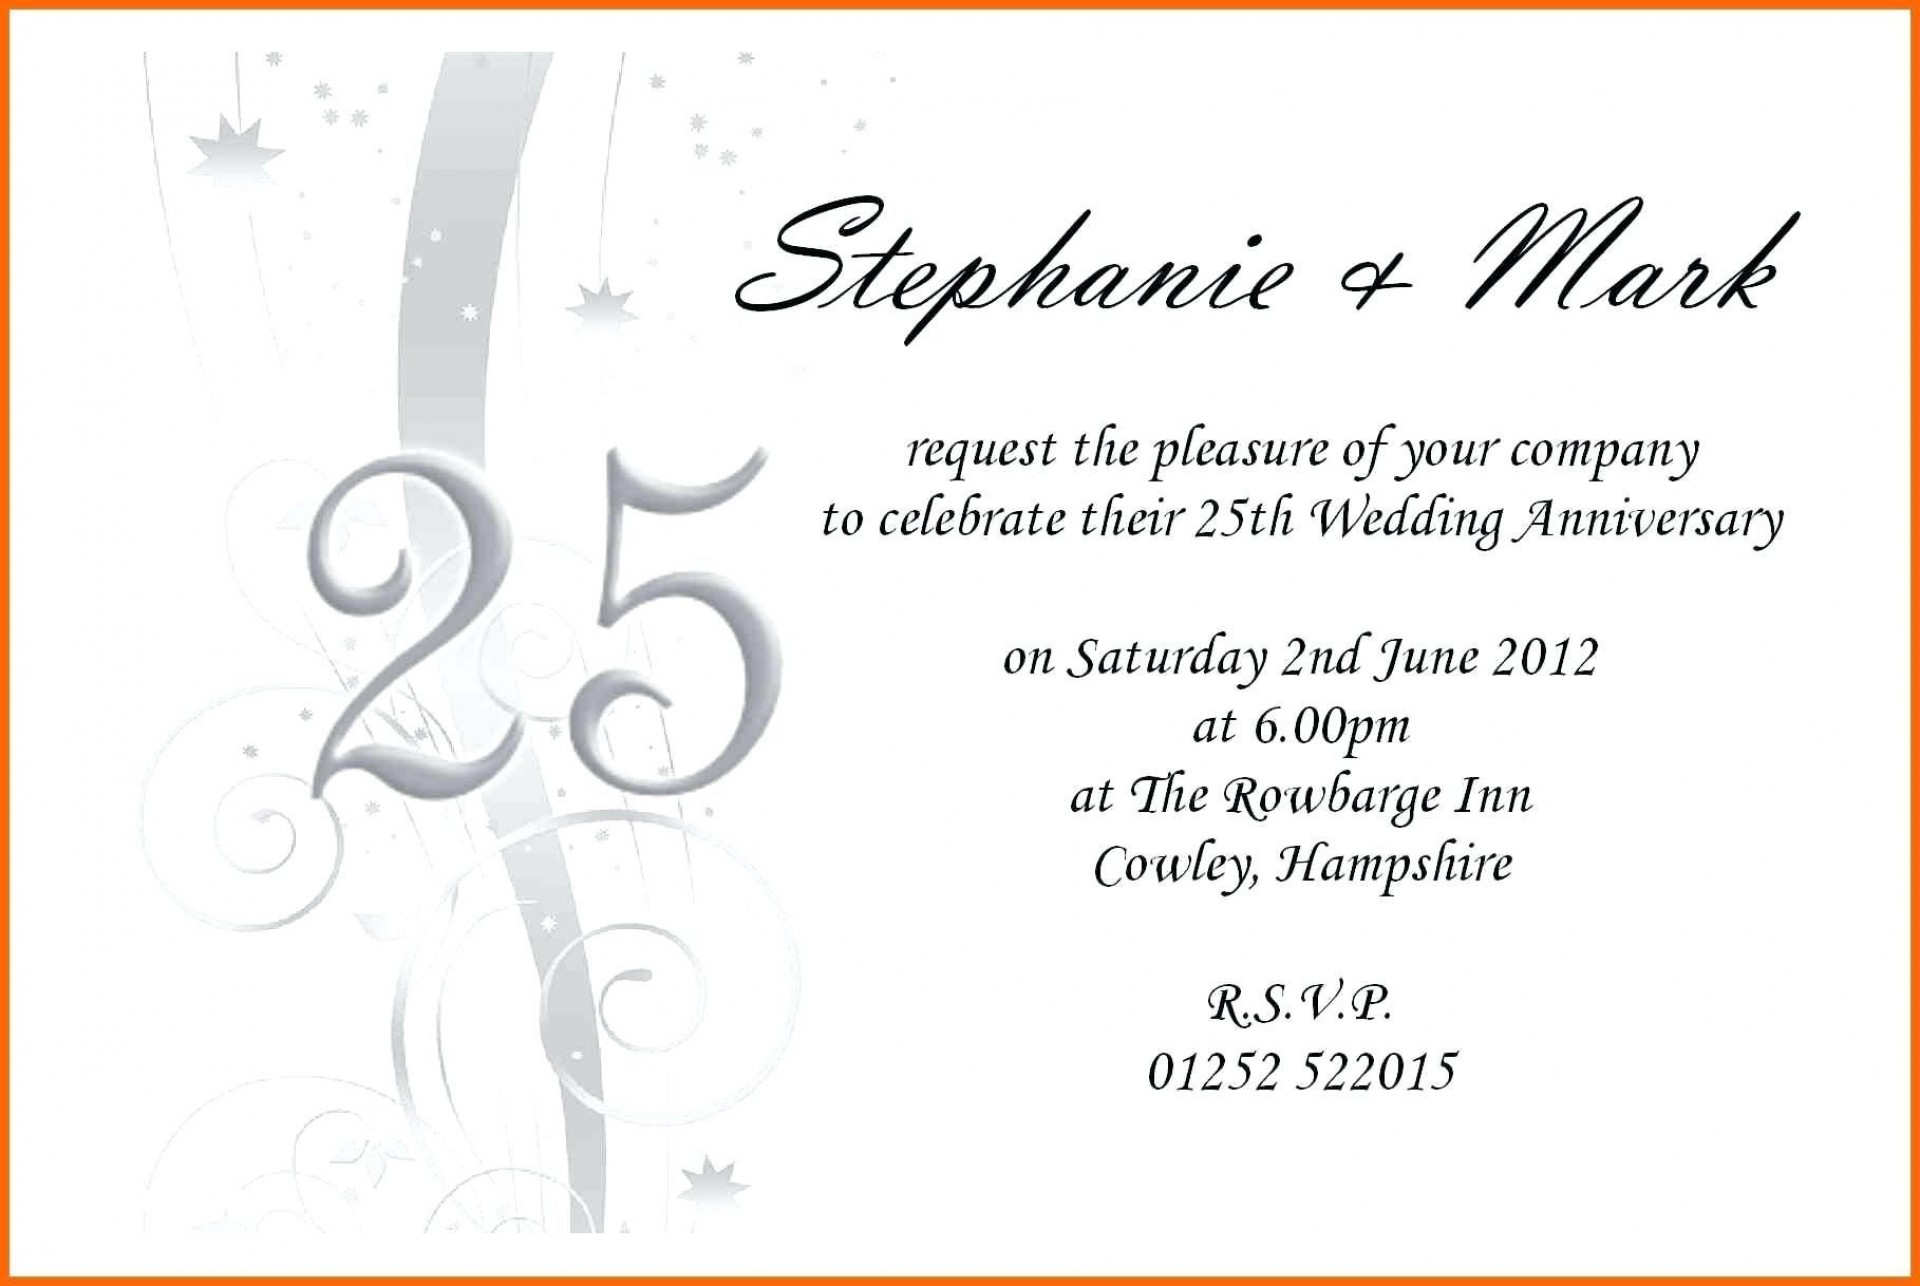 002 Outstanding 50th Wedding Anniversary Invitation Template Microsoft Word Sample  Free1920